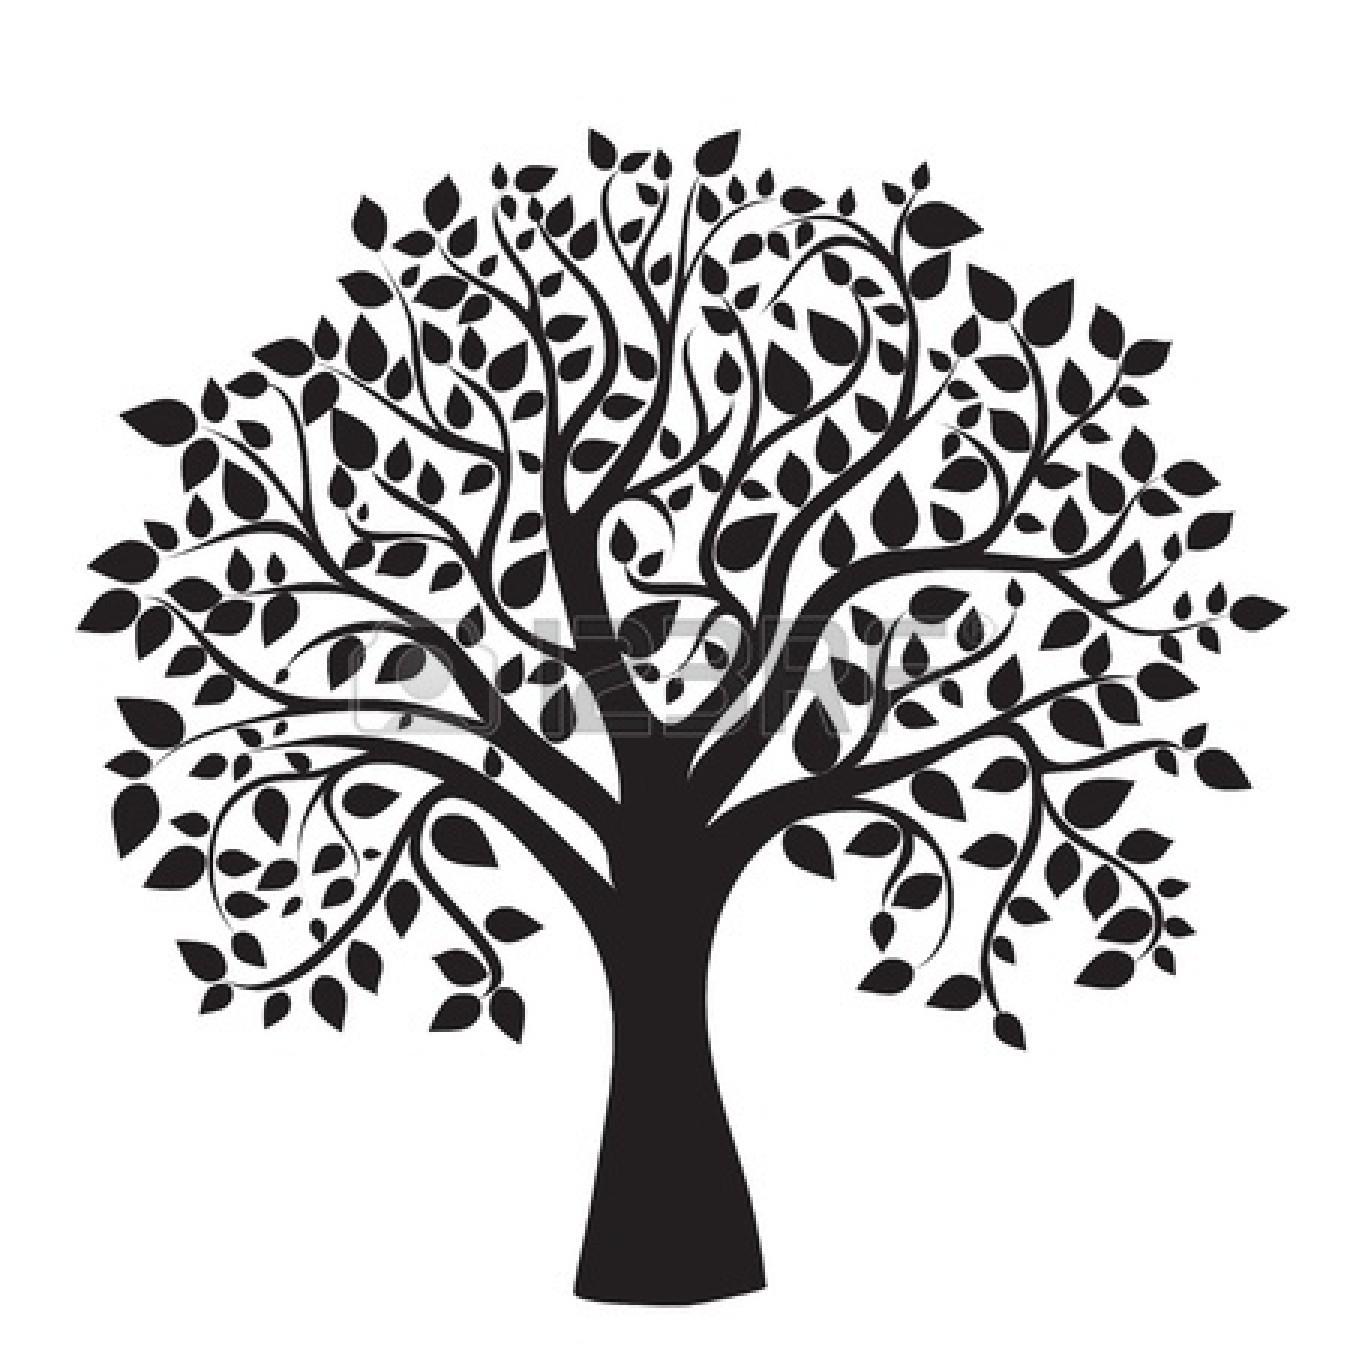 Apple Tree Black And White. Free Tree Clip Art ..